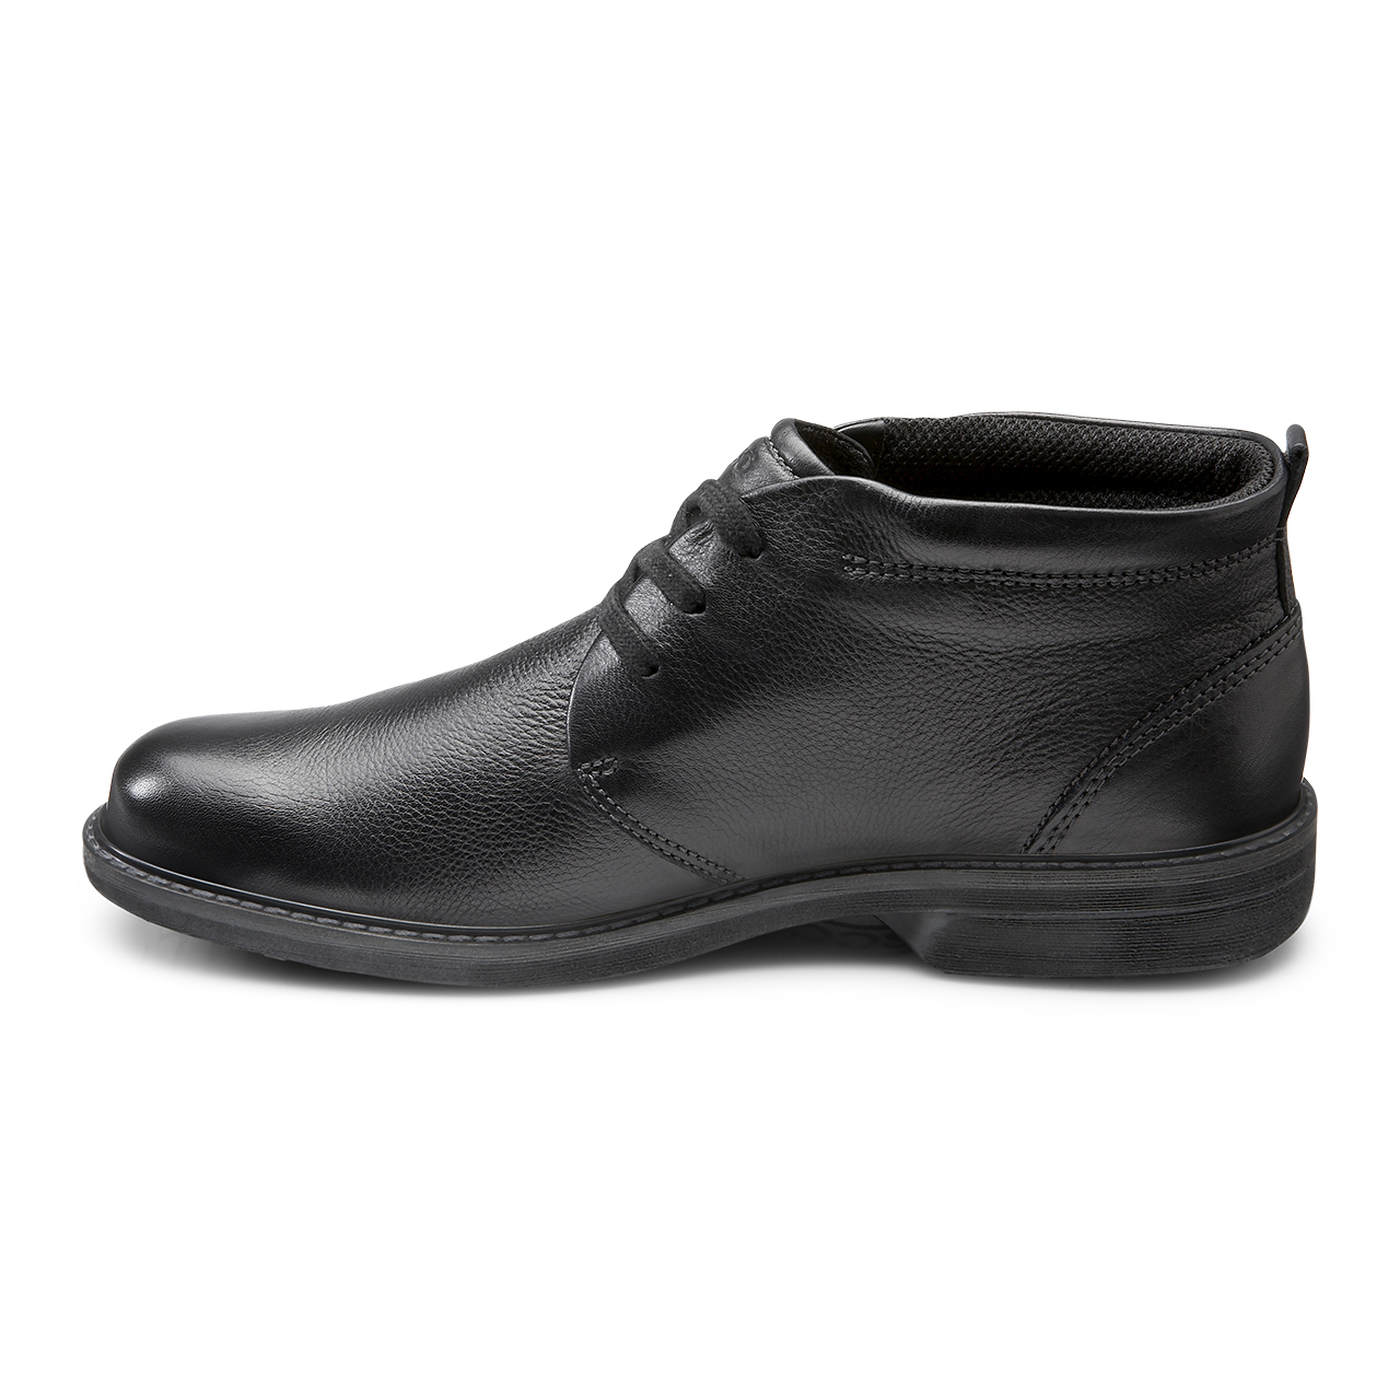 ECCO Turn GTX Boot